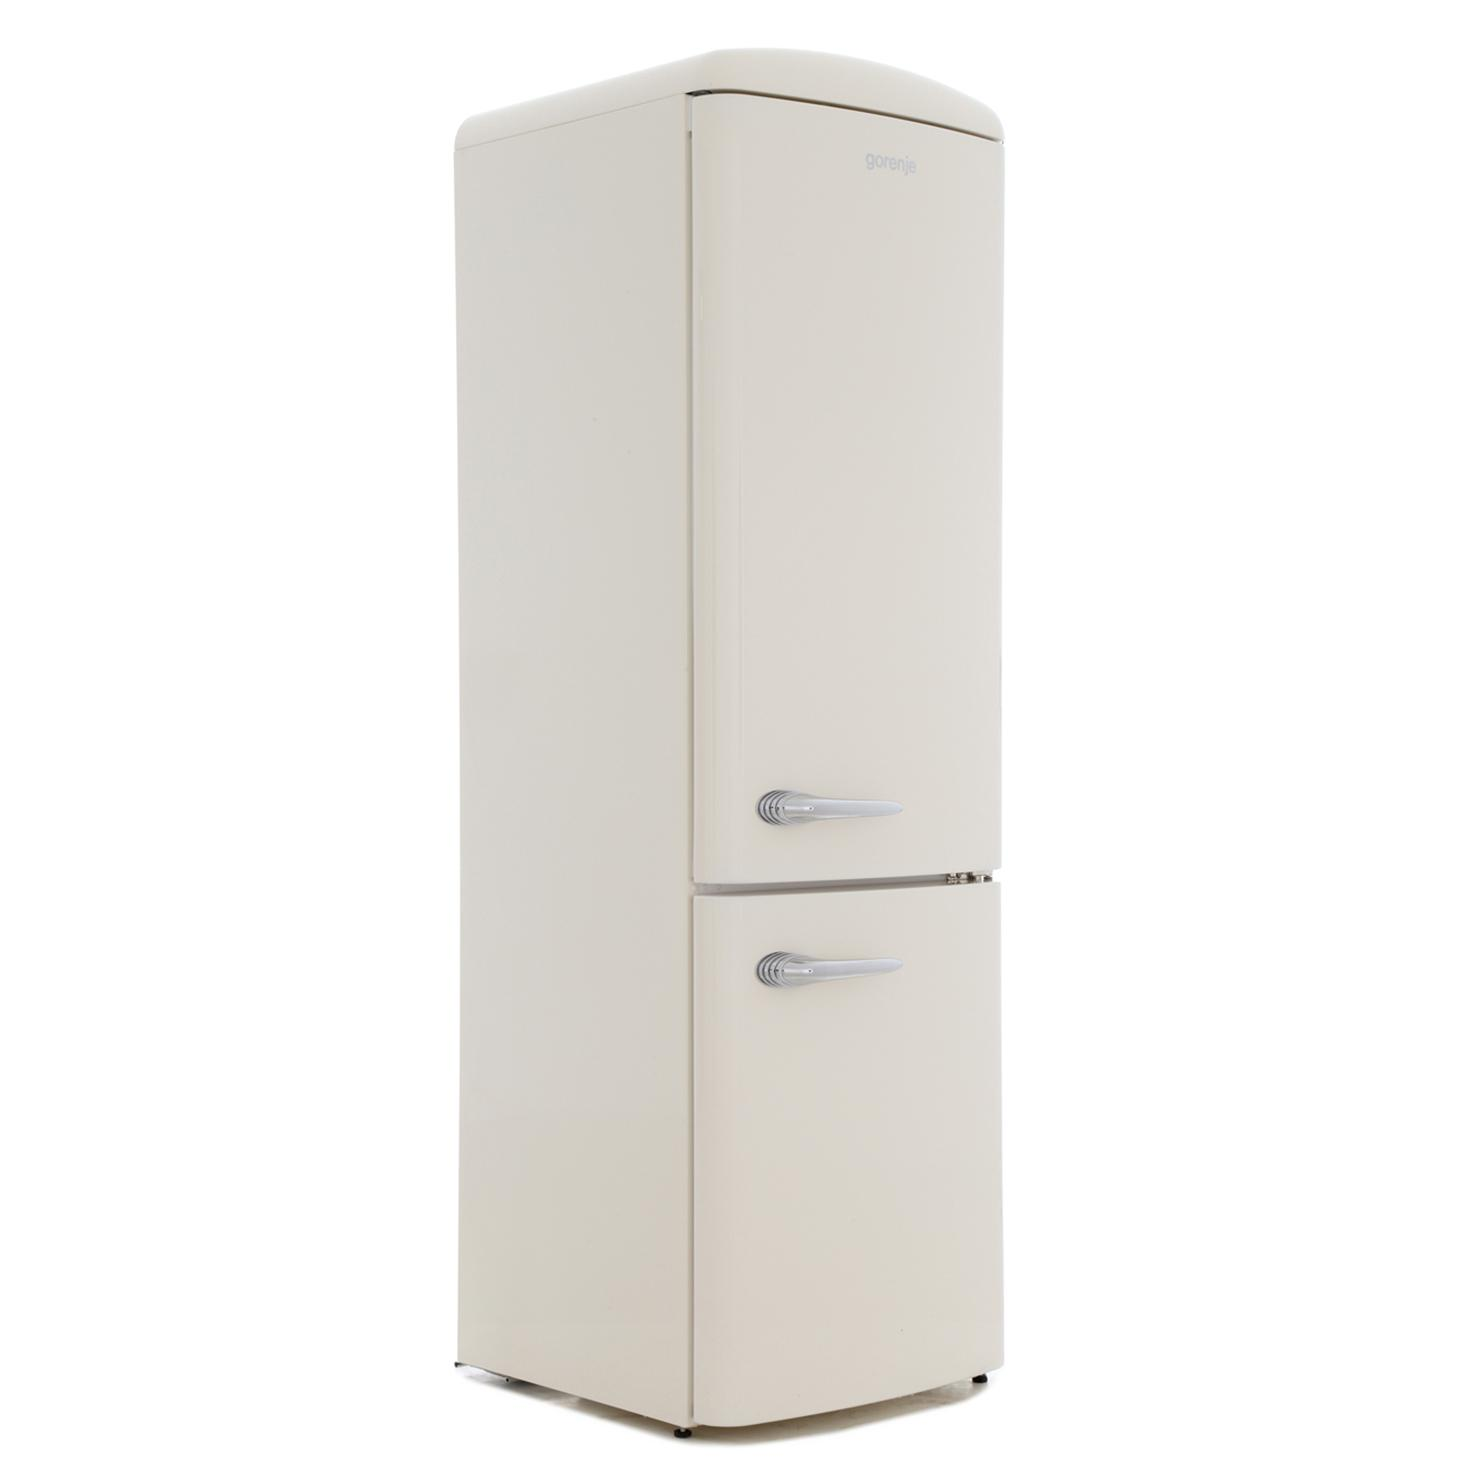 Gorenje ORK193C Retro Static Fridge Freezer